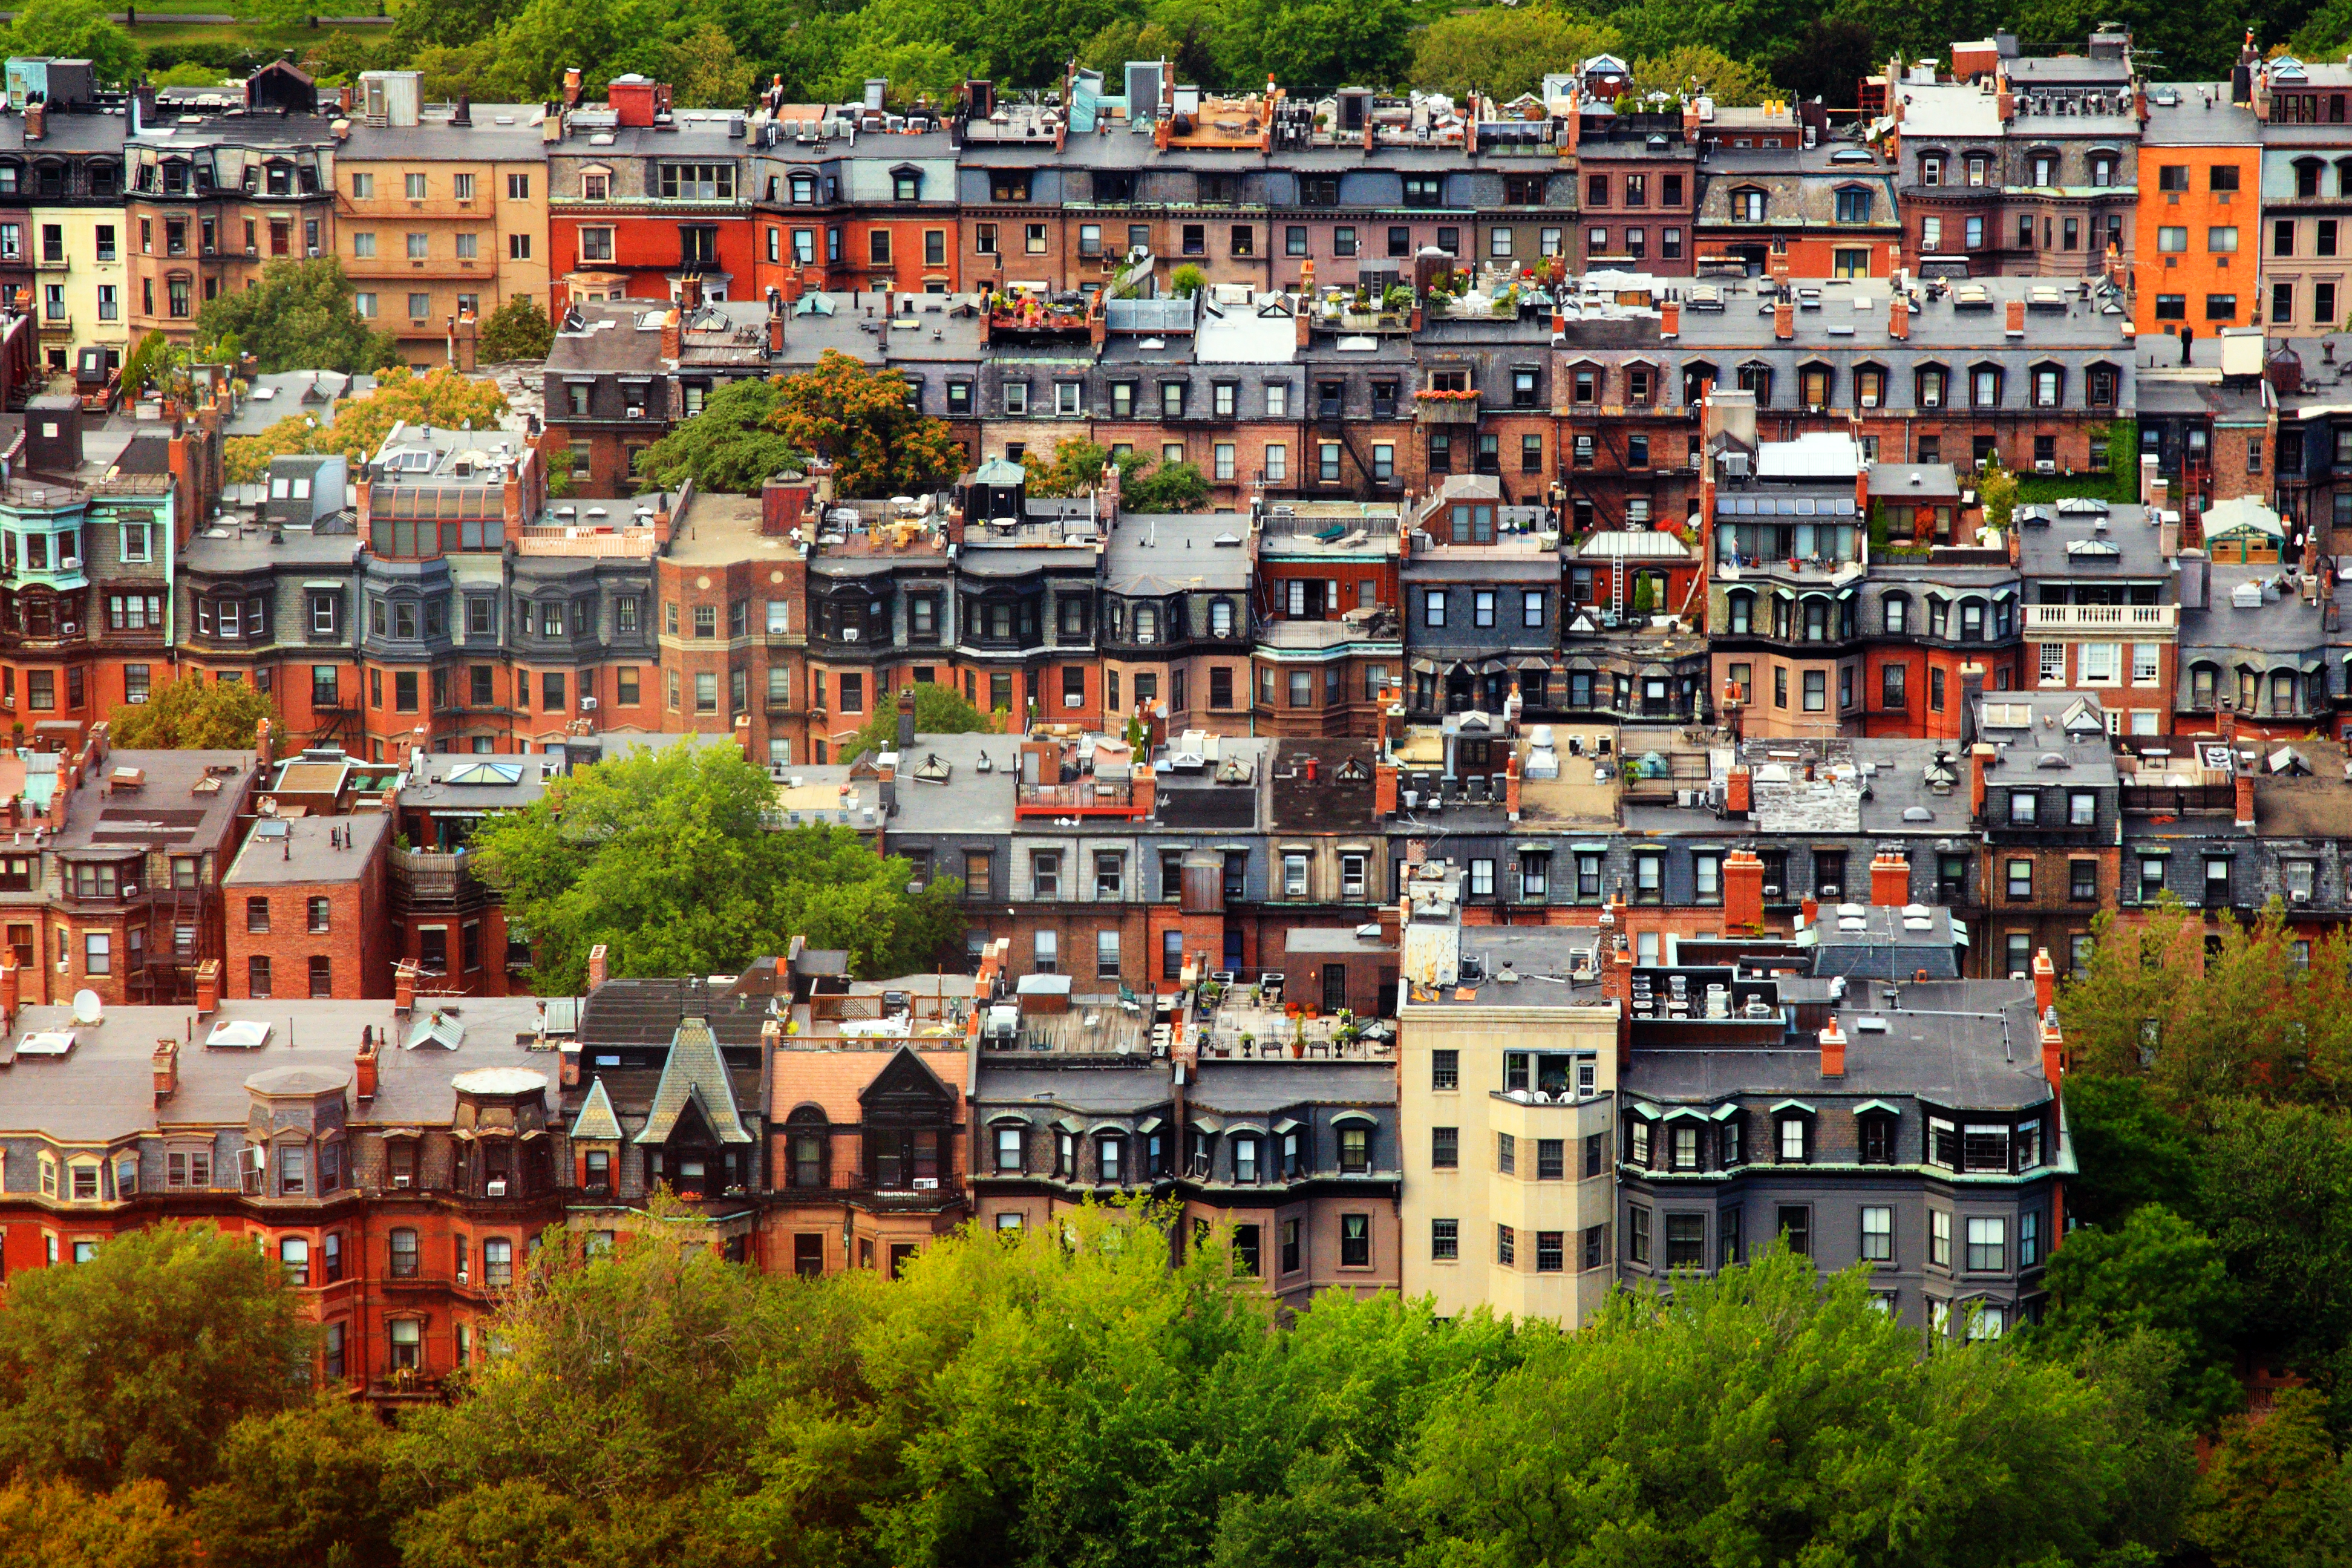 Back Bay Luxury Real Estate, Back Bay Rentals, Back Bay Condos, Boston Real Estate